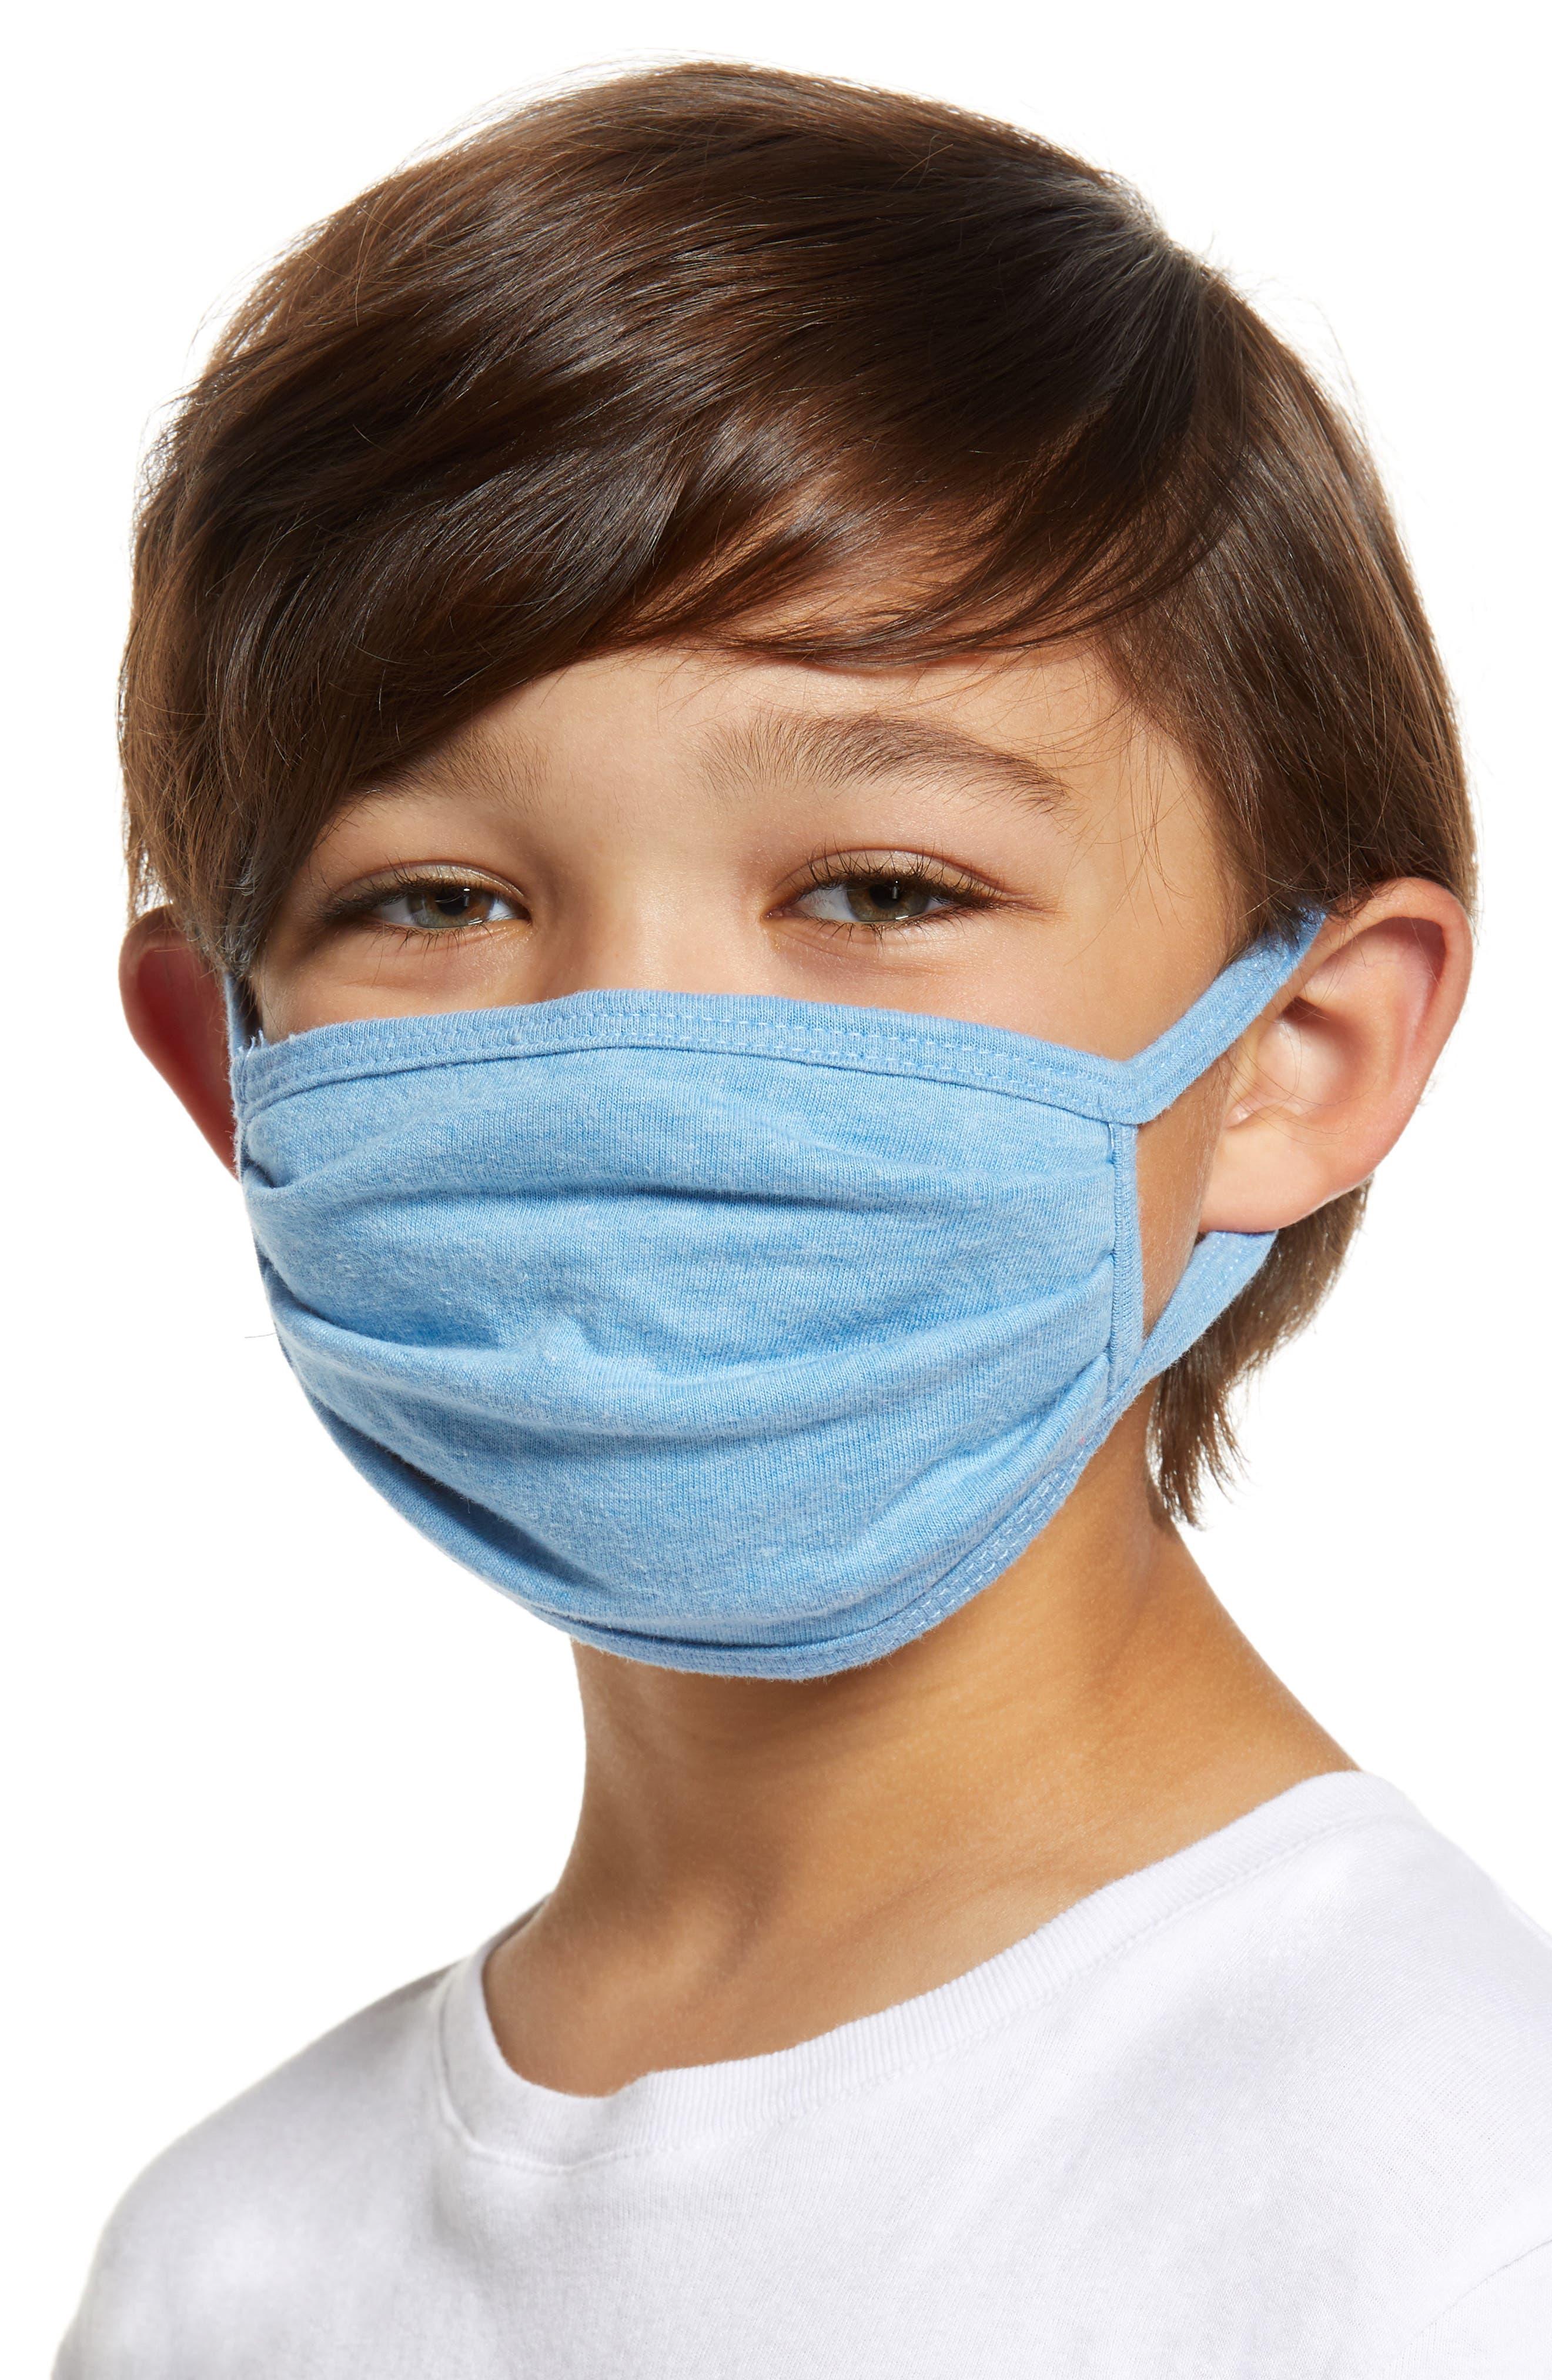 Nordstrom Non-Medical Kid's Face Mask - Set of 4